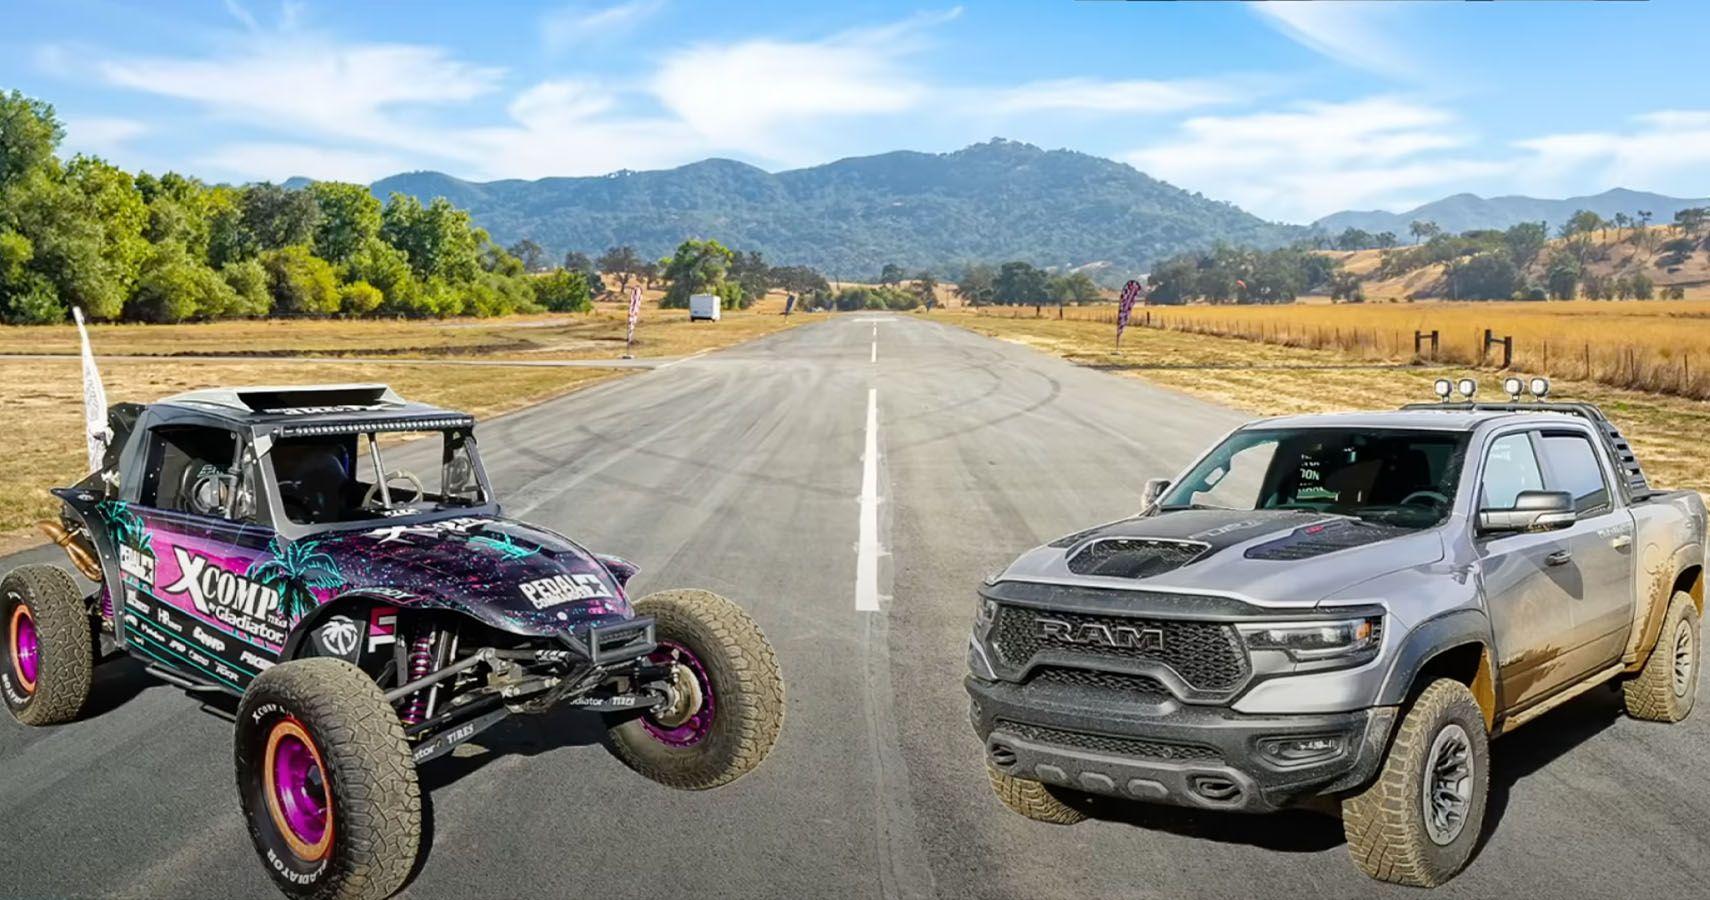 Watch This 582-HP 'Megalodon' Baja Bug Drag Race The Hellcat-Powered Ram TRX